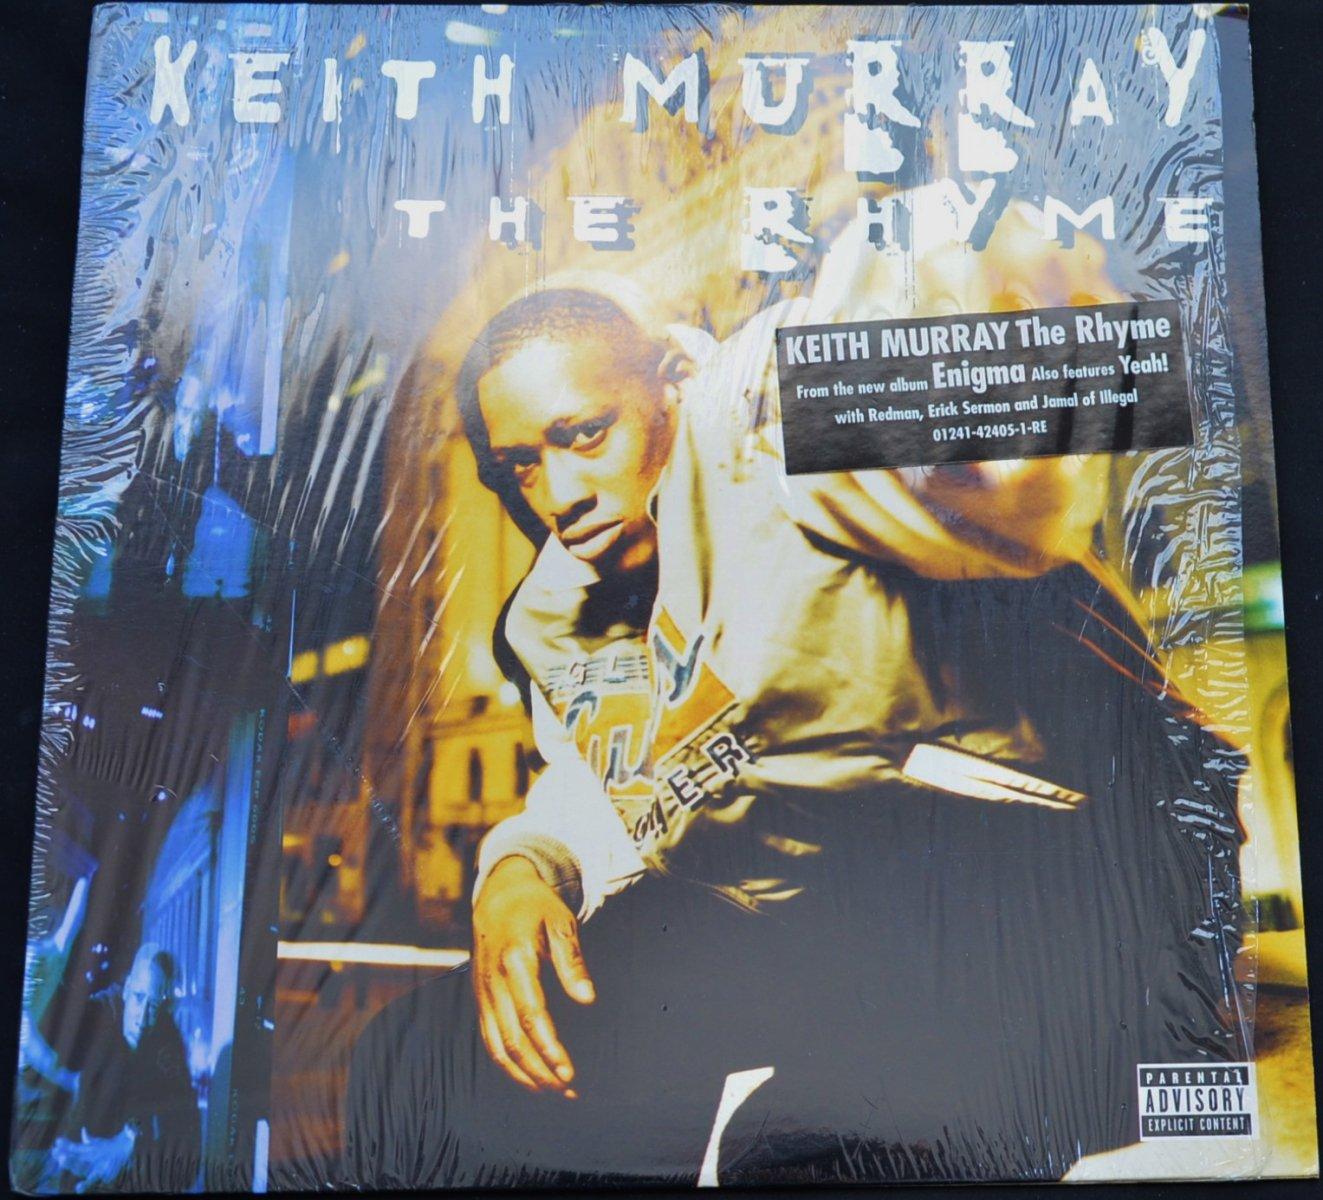 KEITH MURRAY / THE RHYME (PROD BY ERIC SERMON) / THE RHYME (THE SLUM VILLAGE STREET REMIX) (1